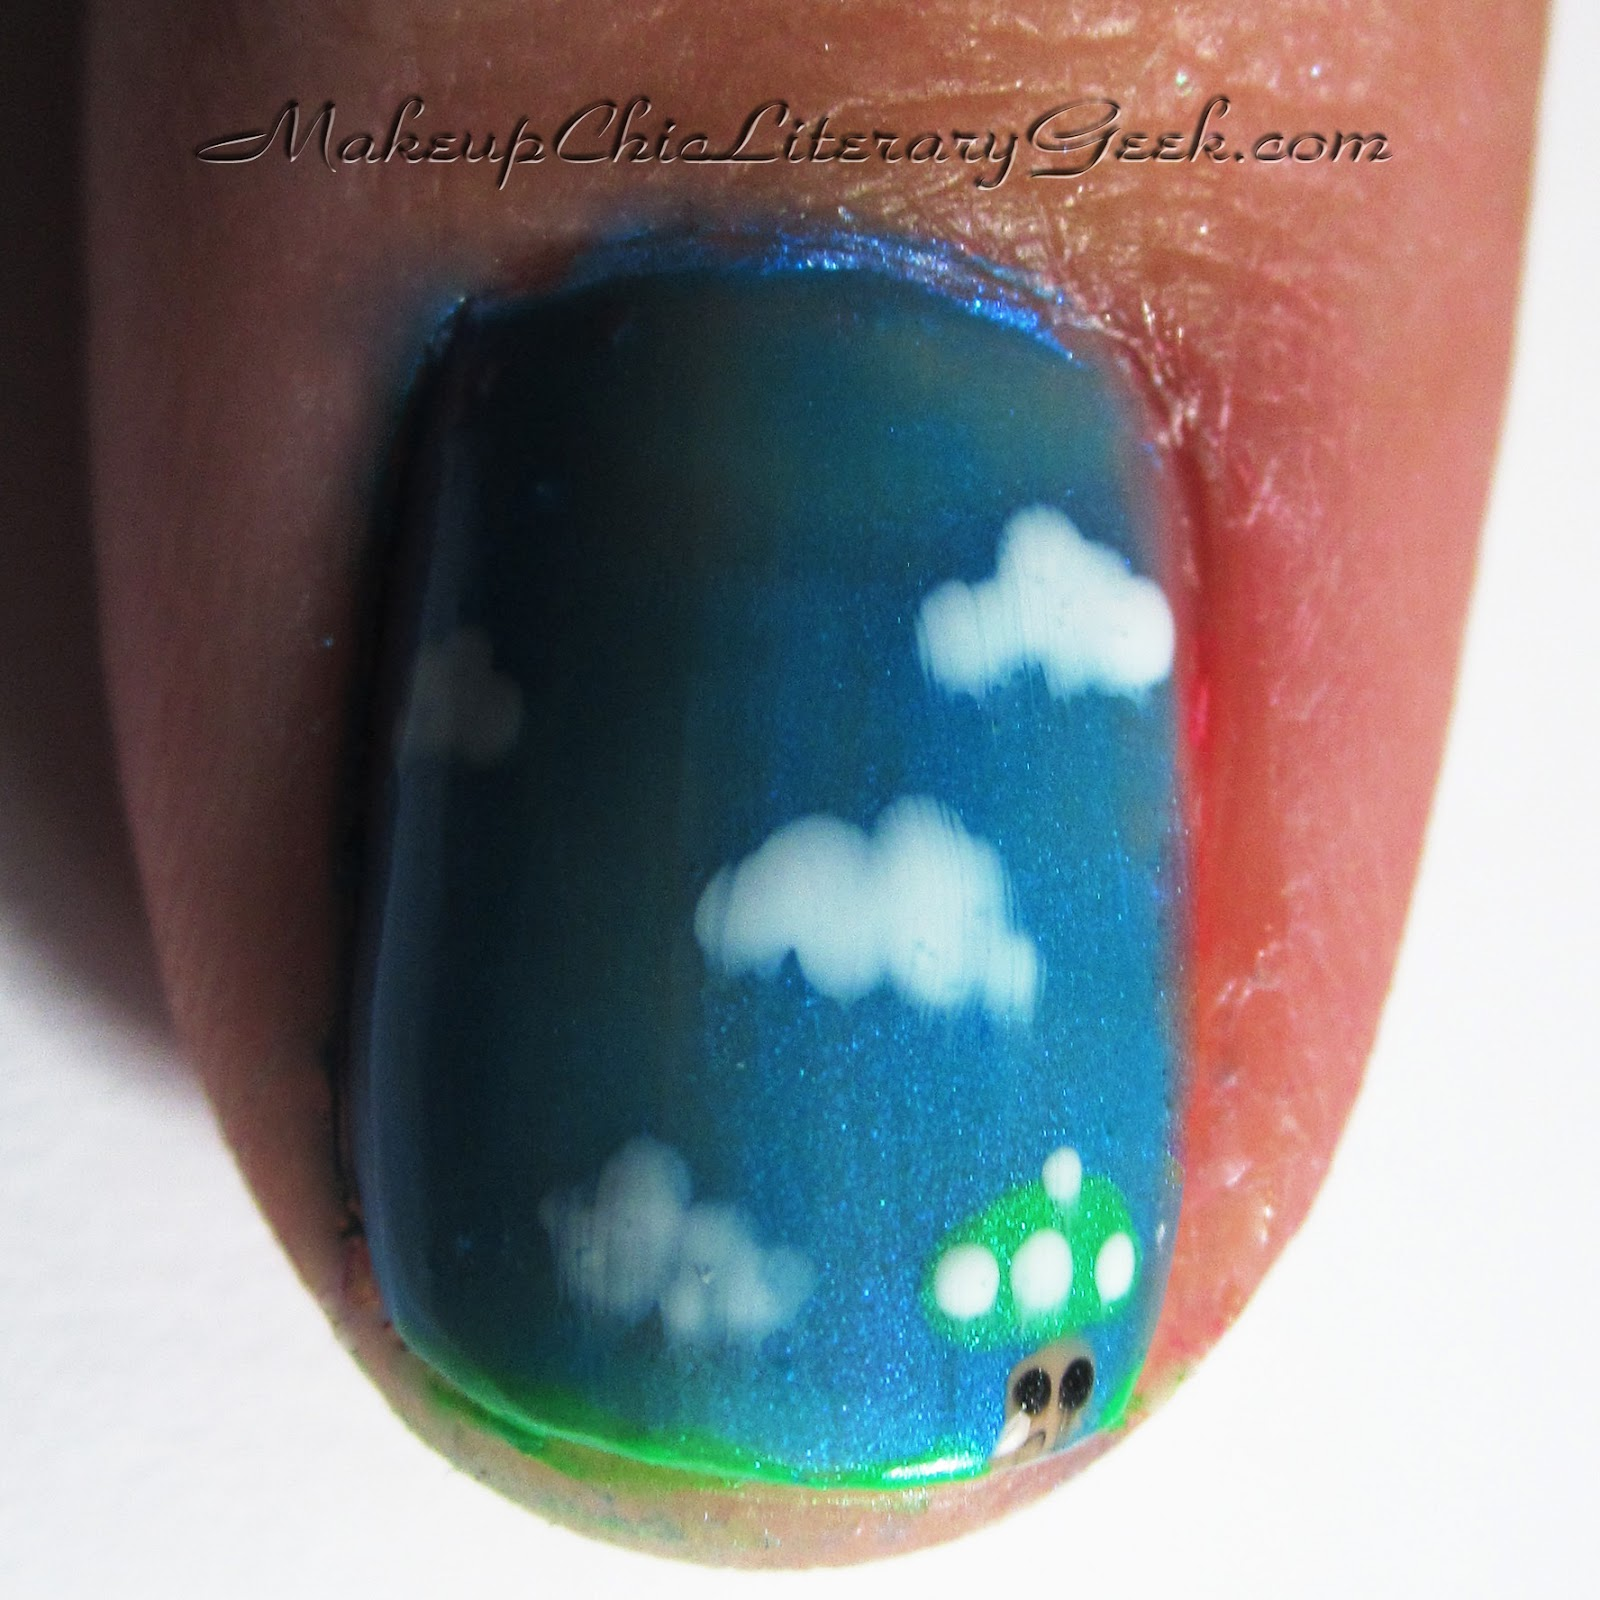 BeautyPopStop: Nail Art: Nintendo Mani